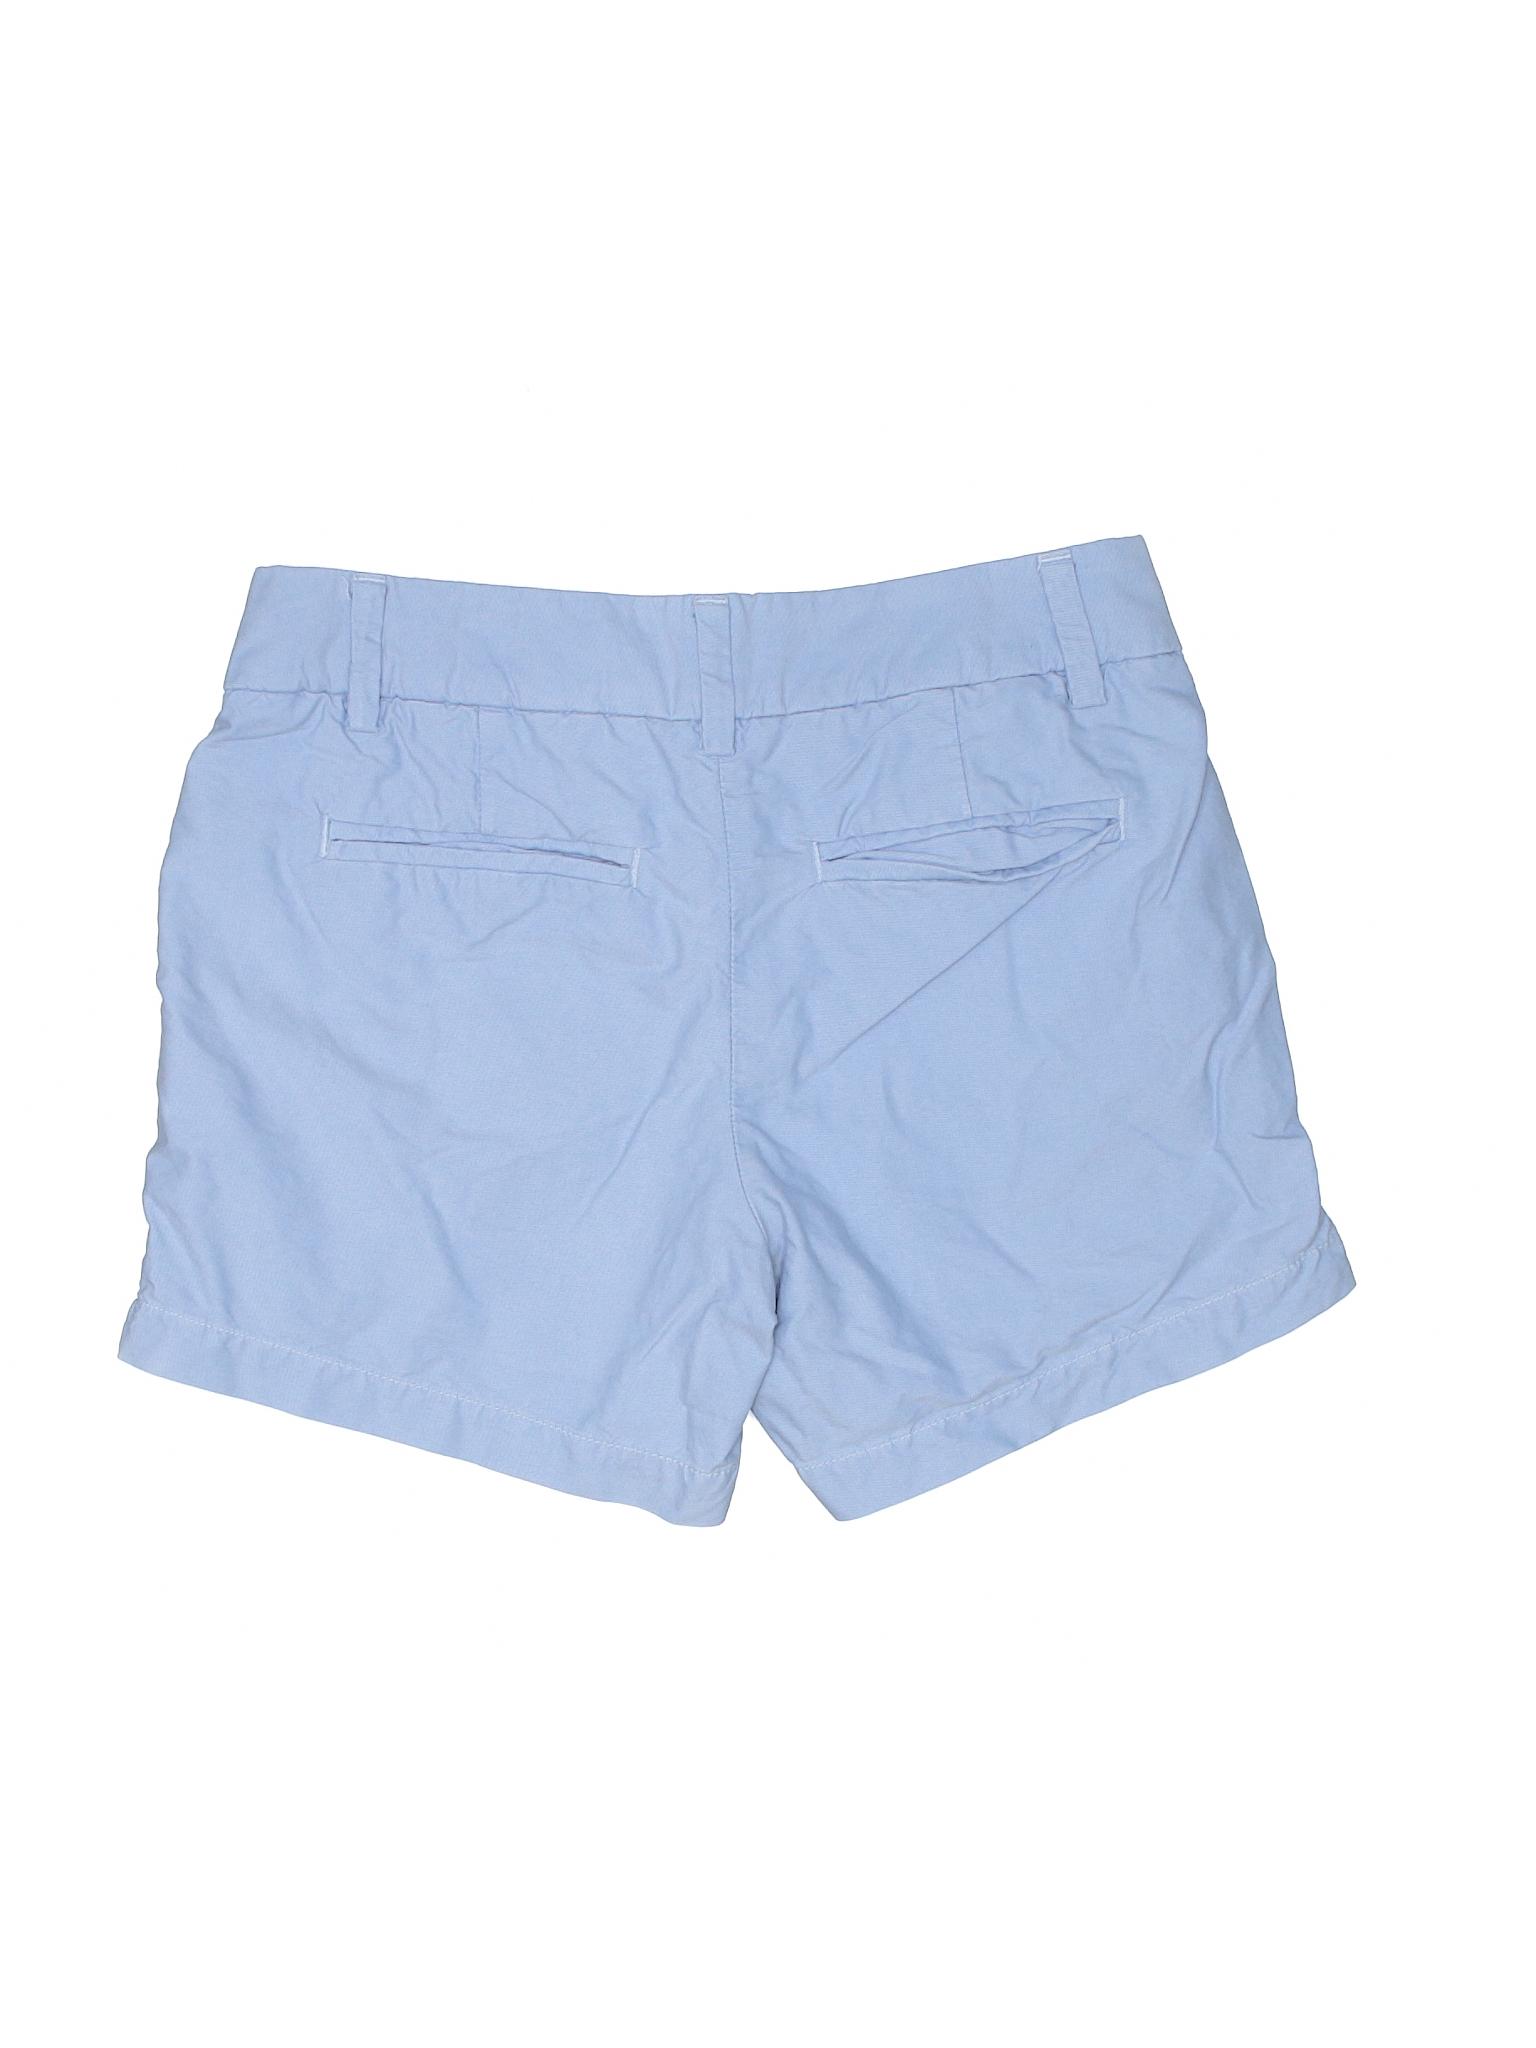 Boutique Boutique Khaki J Crew Shorts J WvnrvTB6